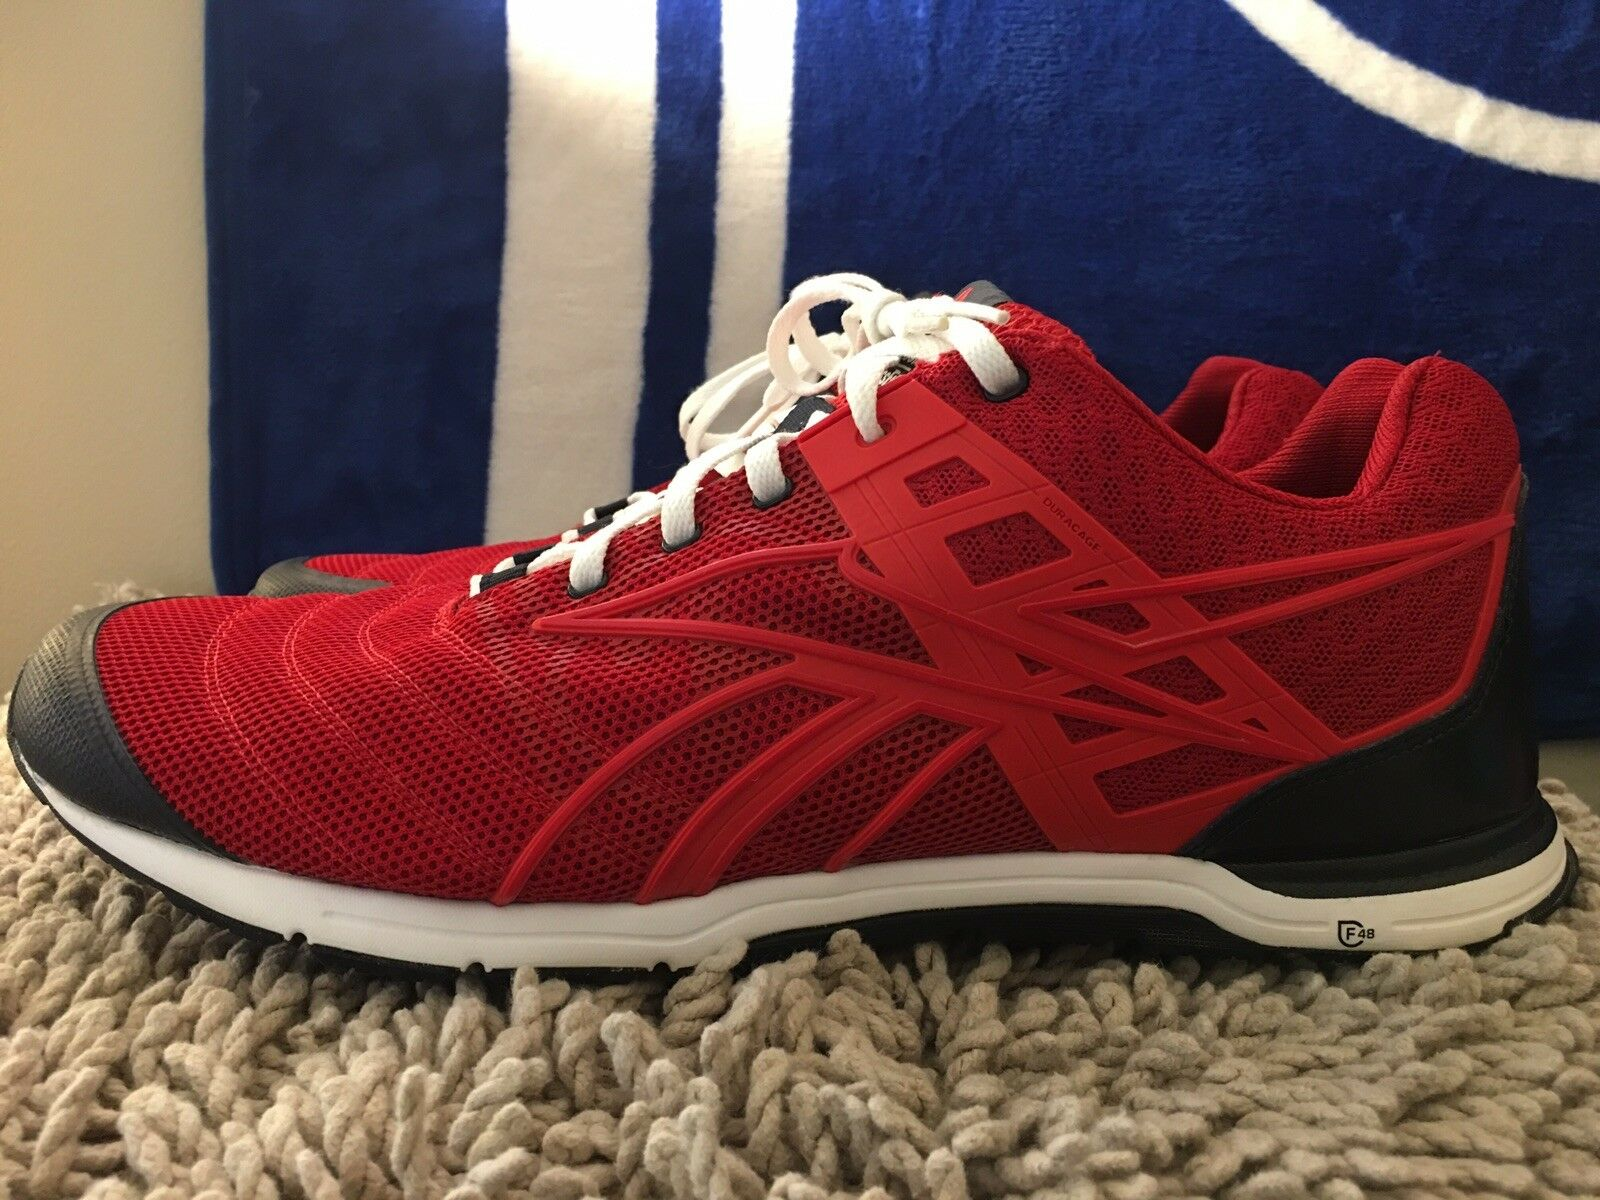 Reebok Crossfit Nano Training shoes, V60157, Red   White, Men's Size 12